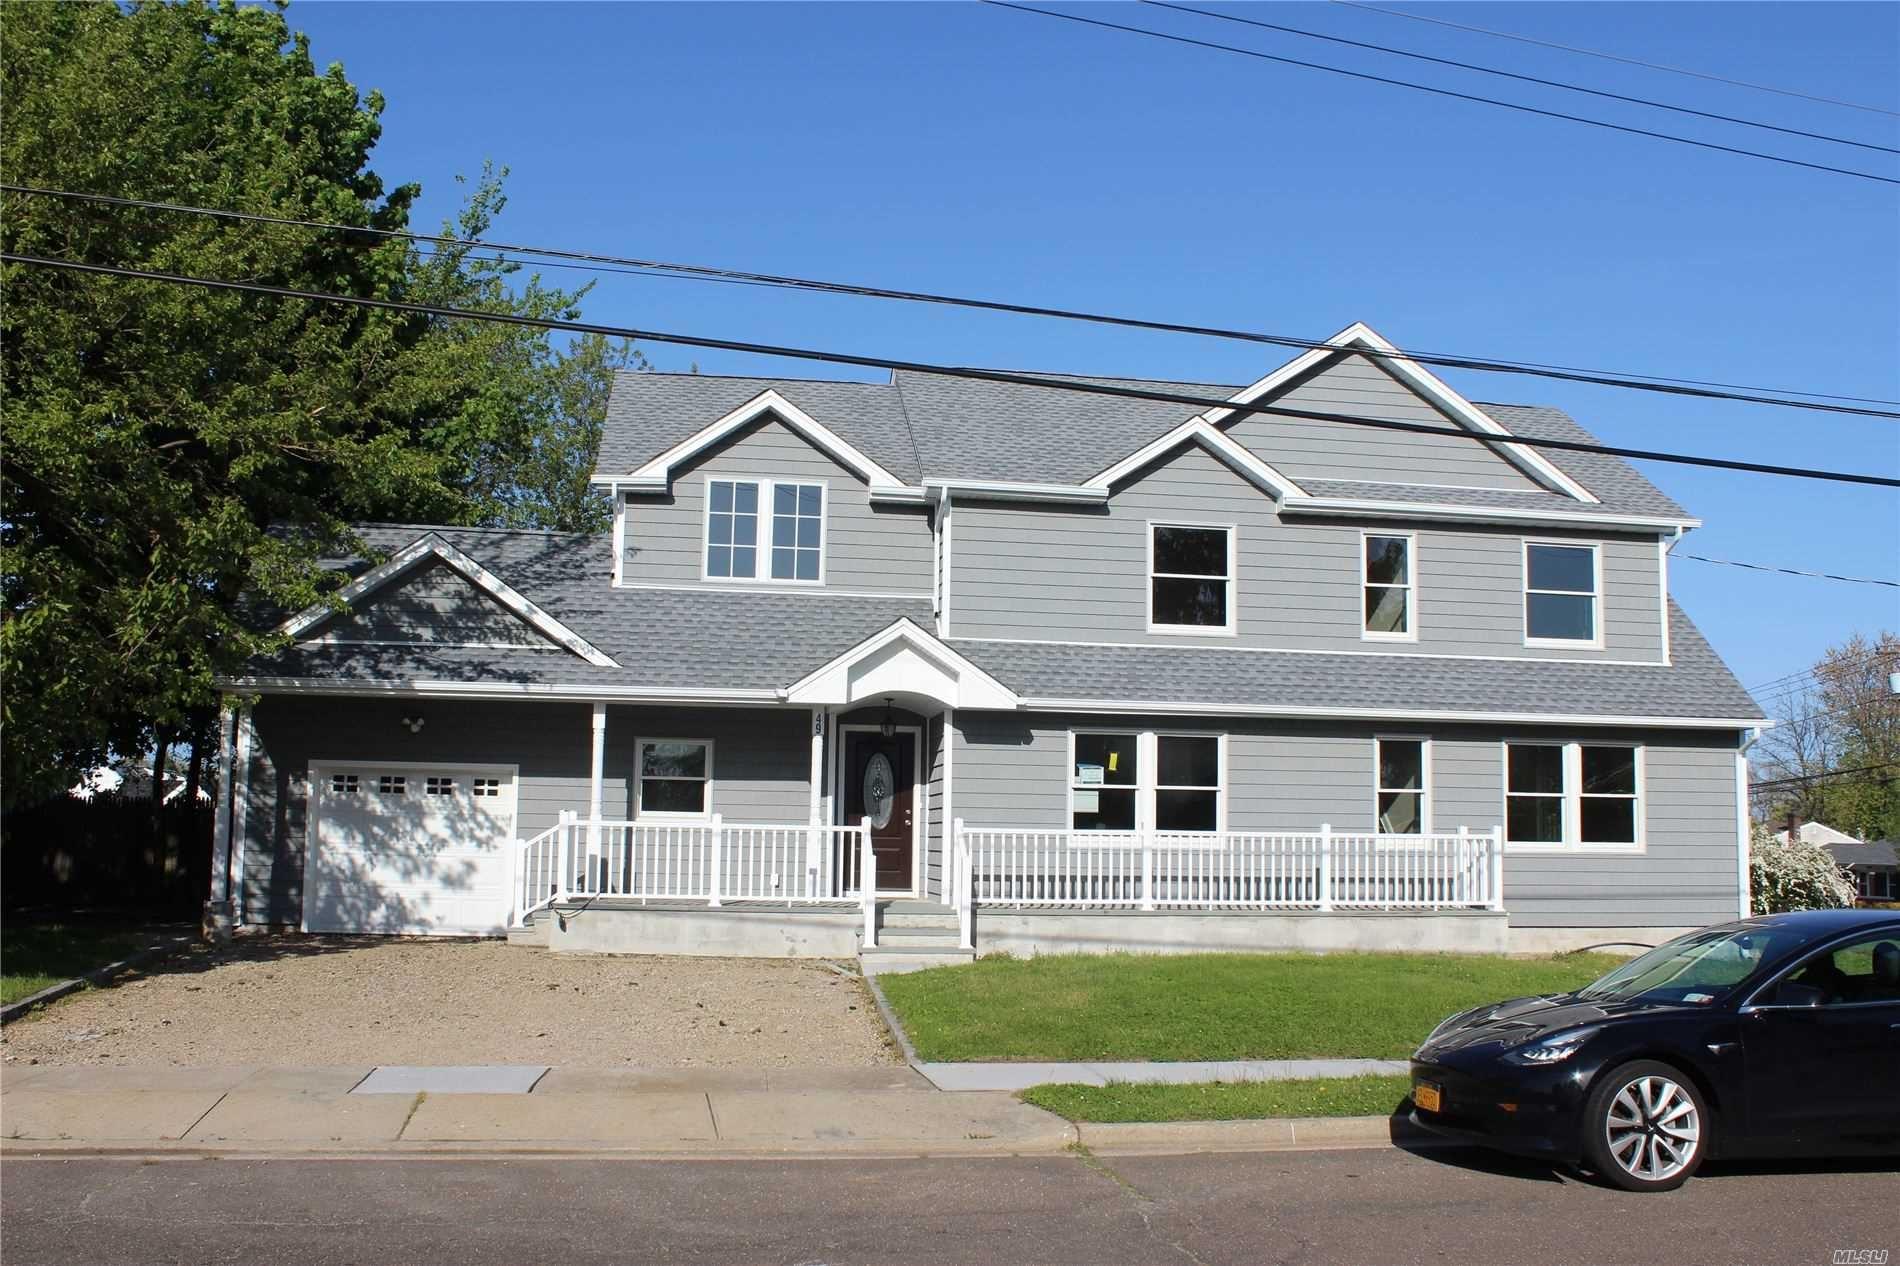 49 Graham Street, Farmingdale, NY 11735 - MLS#: 3217283